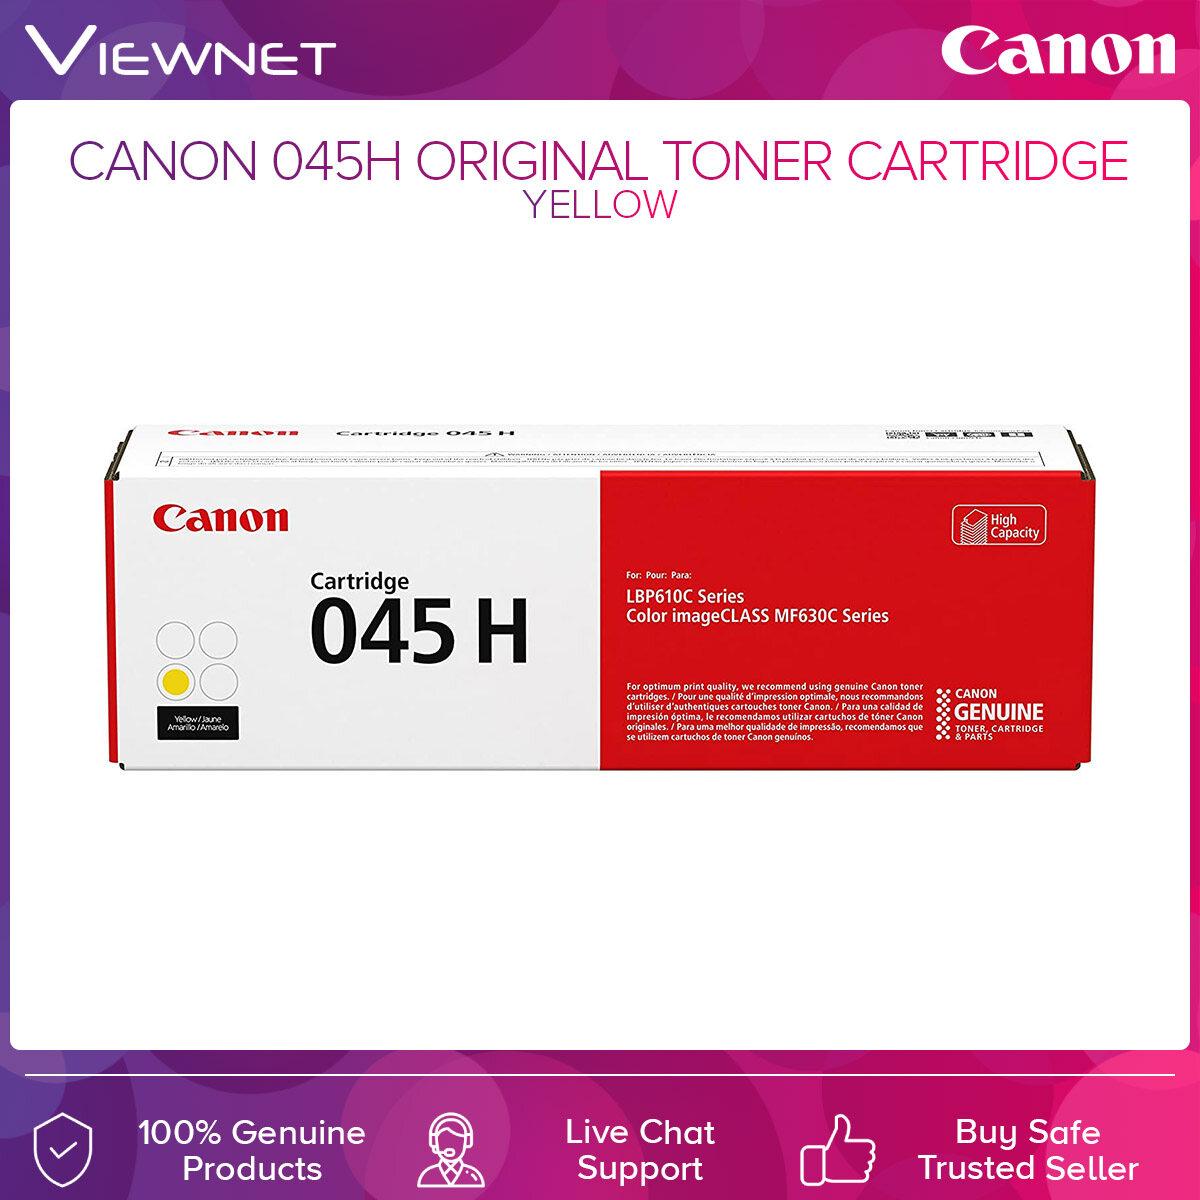 Canon 045H ORIGINAL TONER CARTRIDGE Black  Cyan  Magenta  Yellow